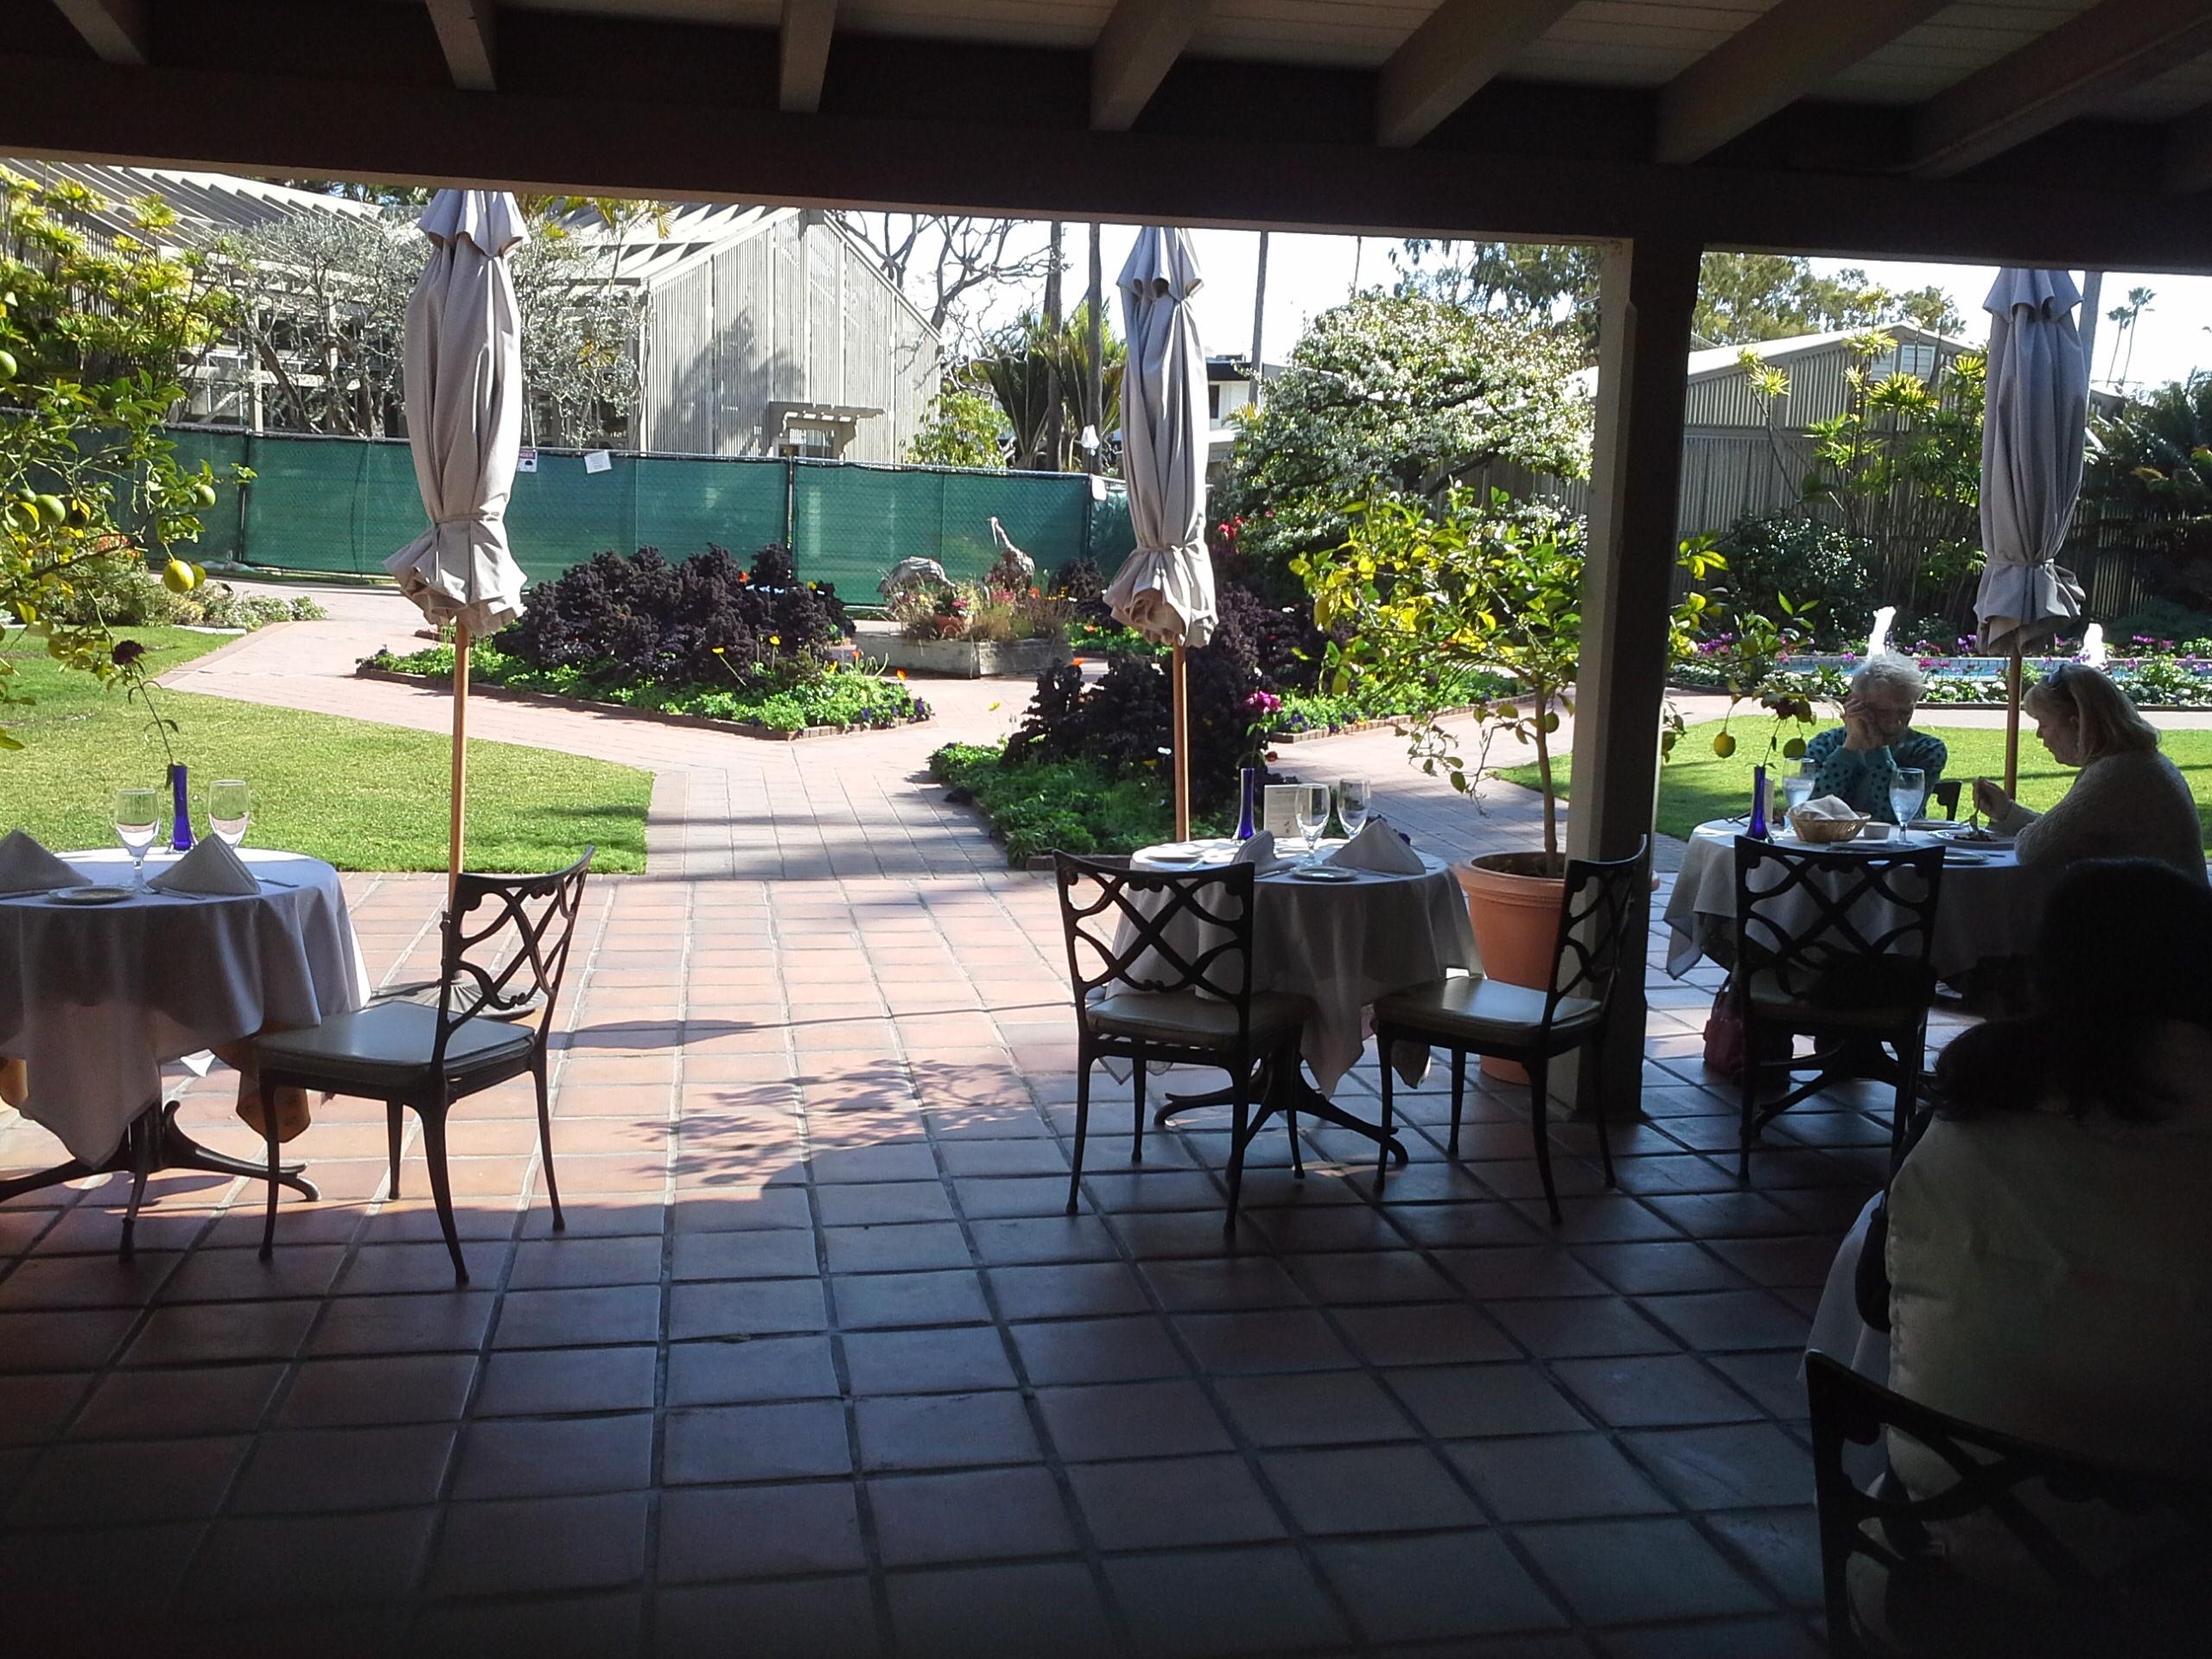 Cafe Jardin image 8